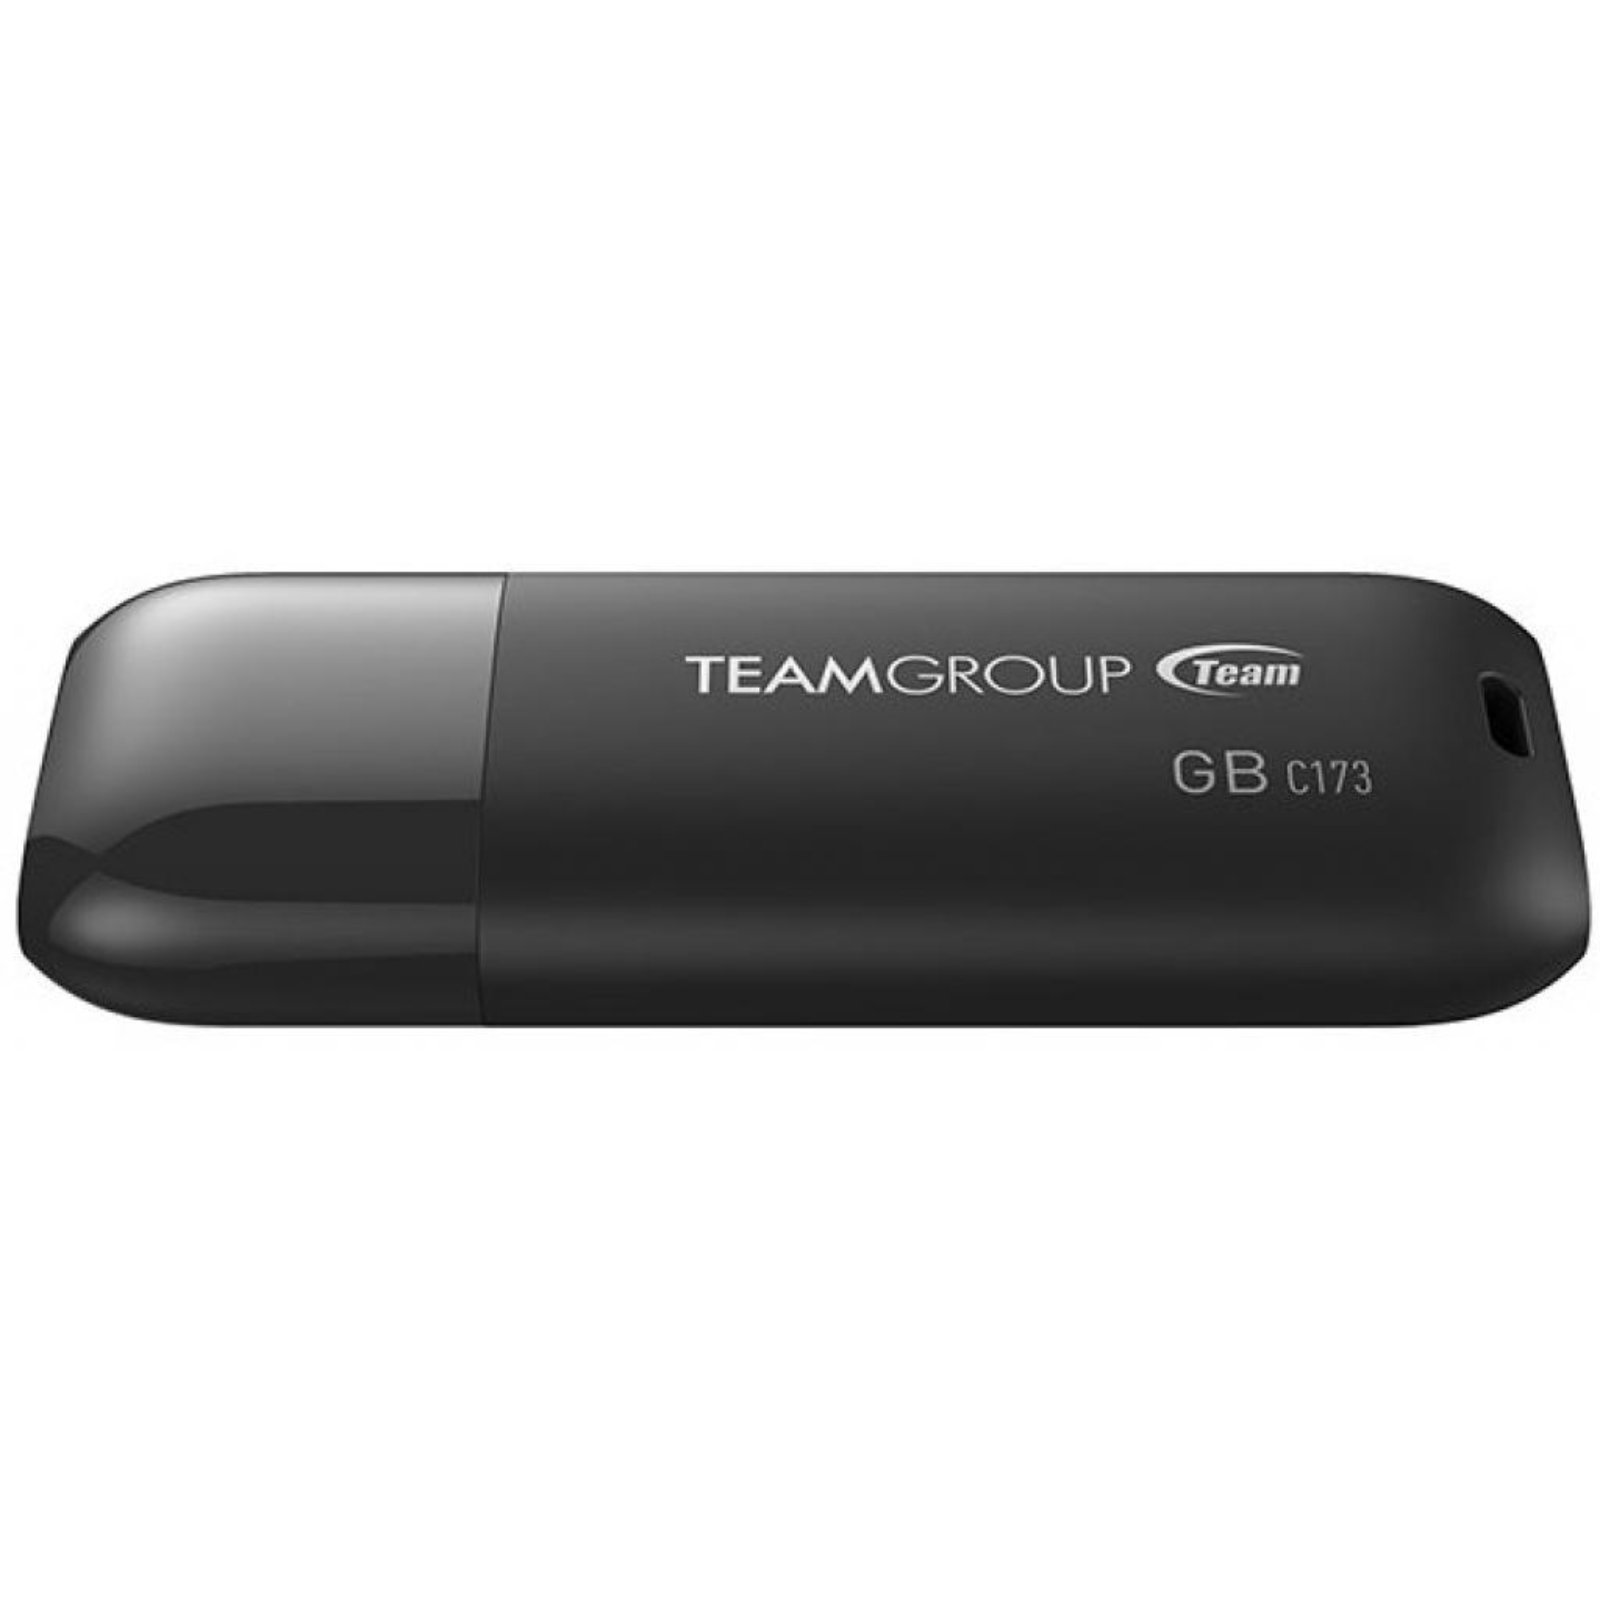 USB флеш накопитель Team 32GB C173 Pearl White USB 2.0 (TC17332GW01) изображение 2